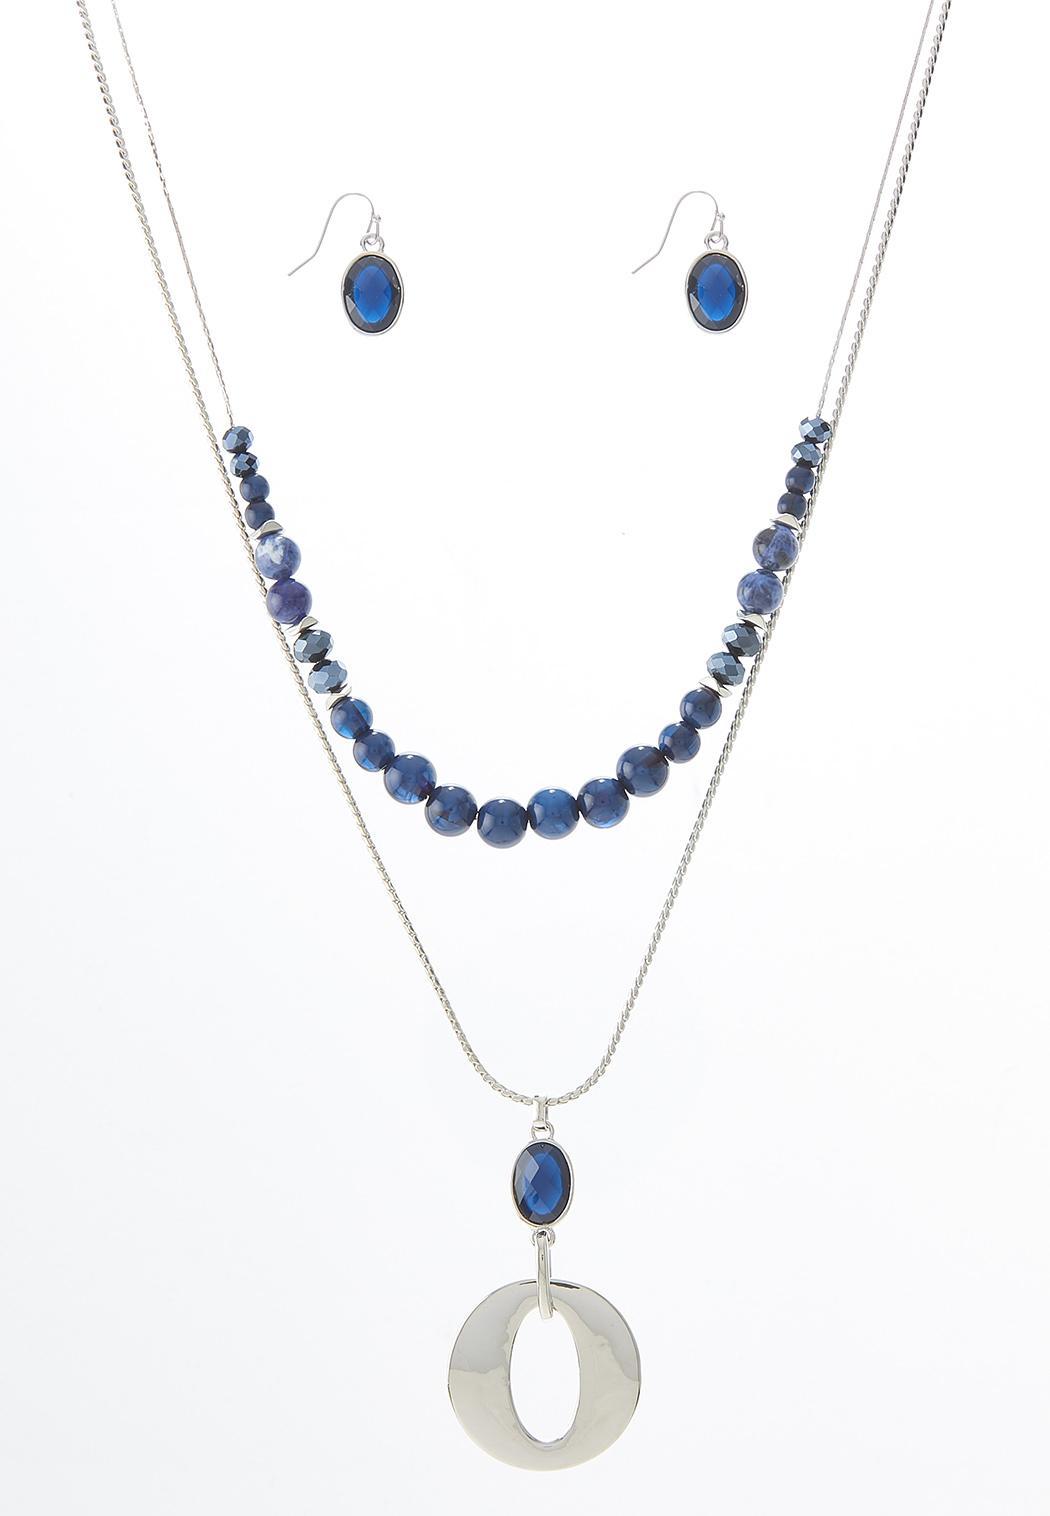 Layered Semi Precious Necklace Earring Set